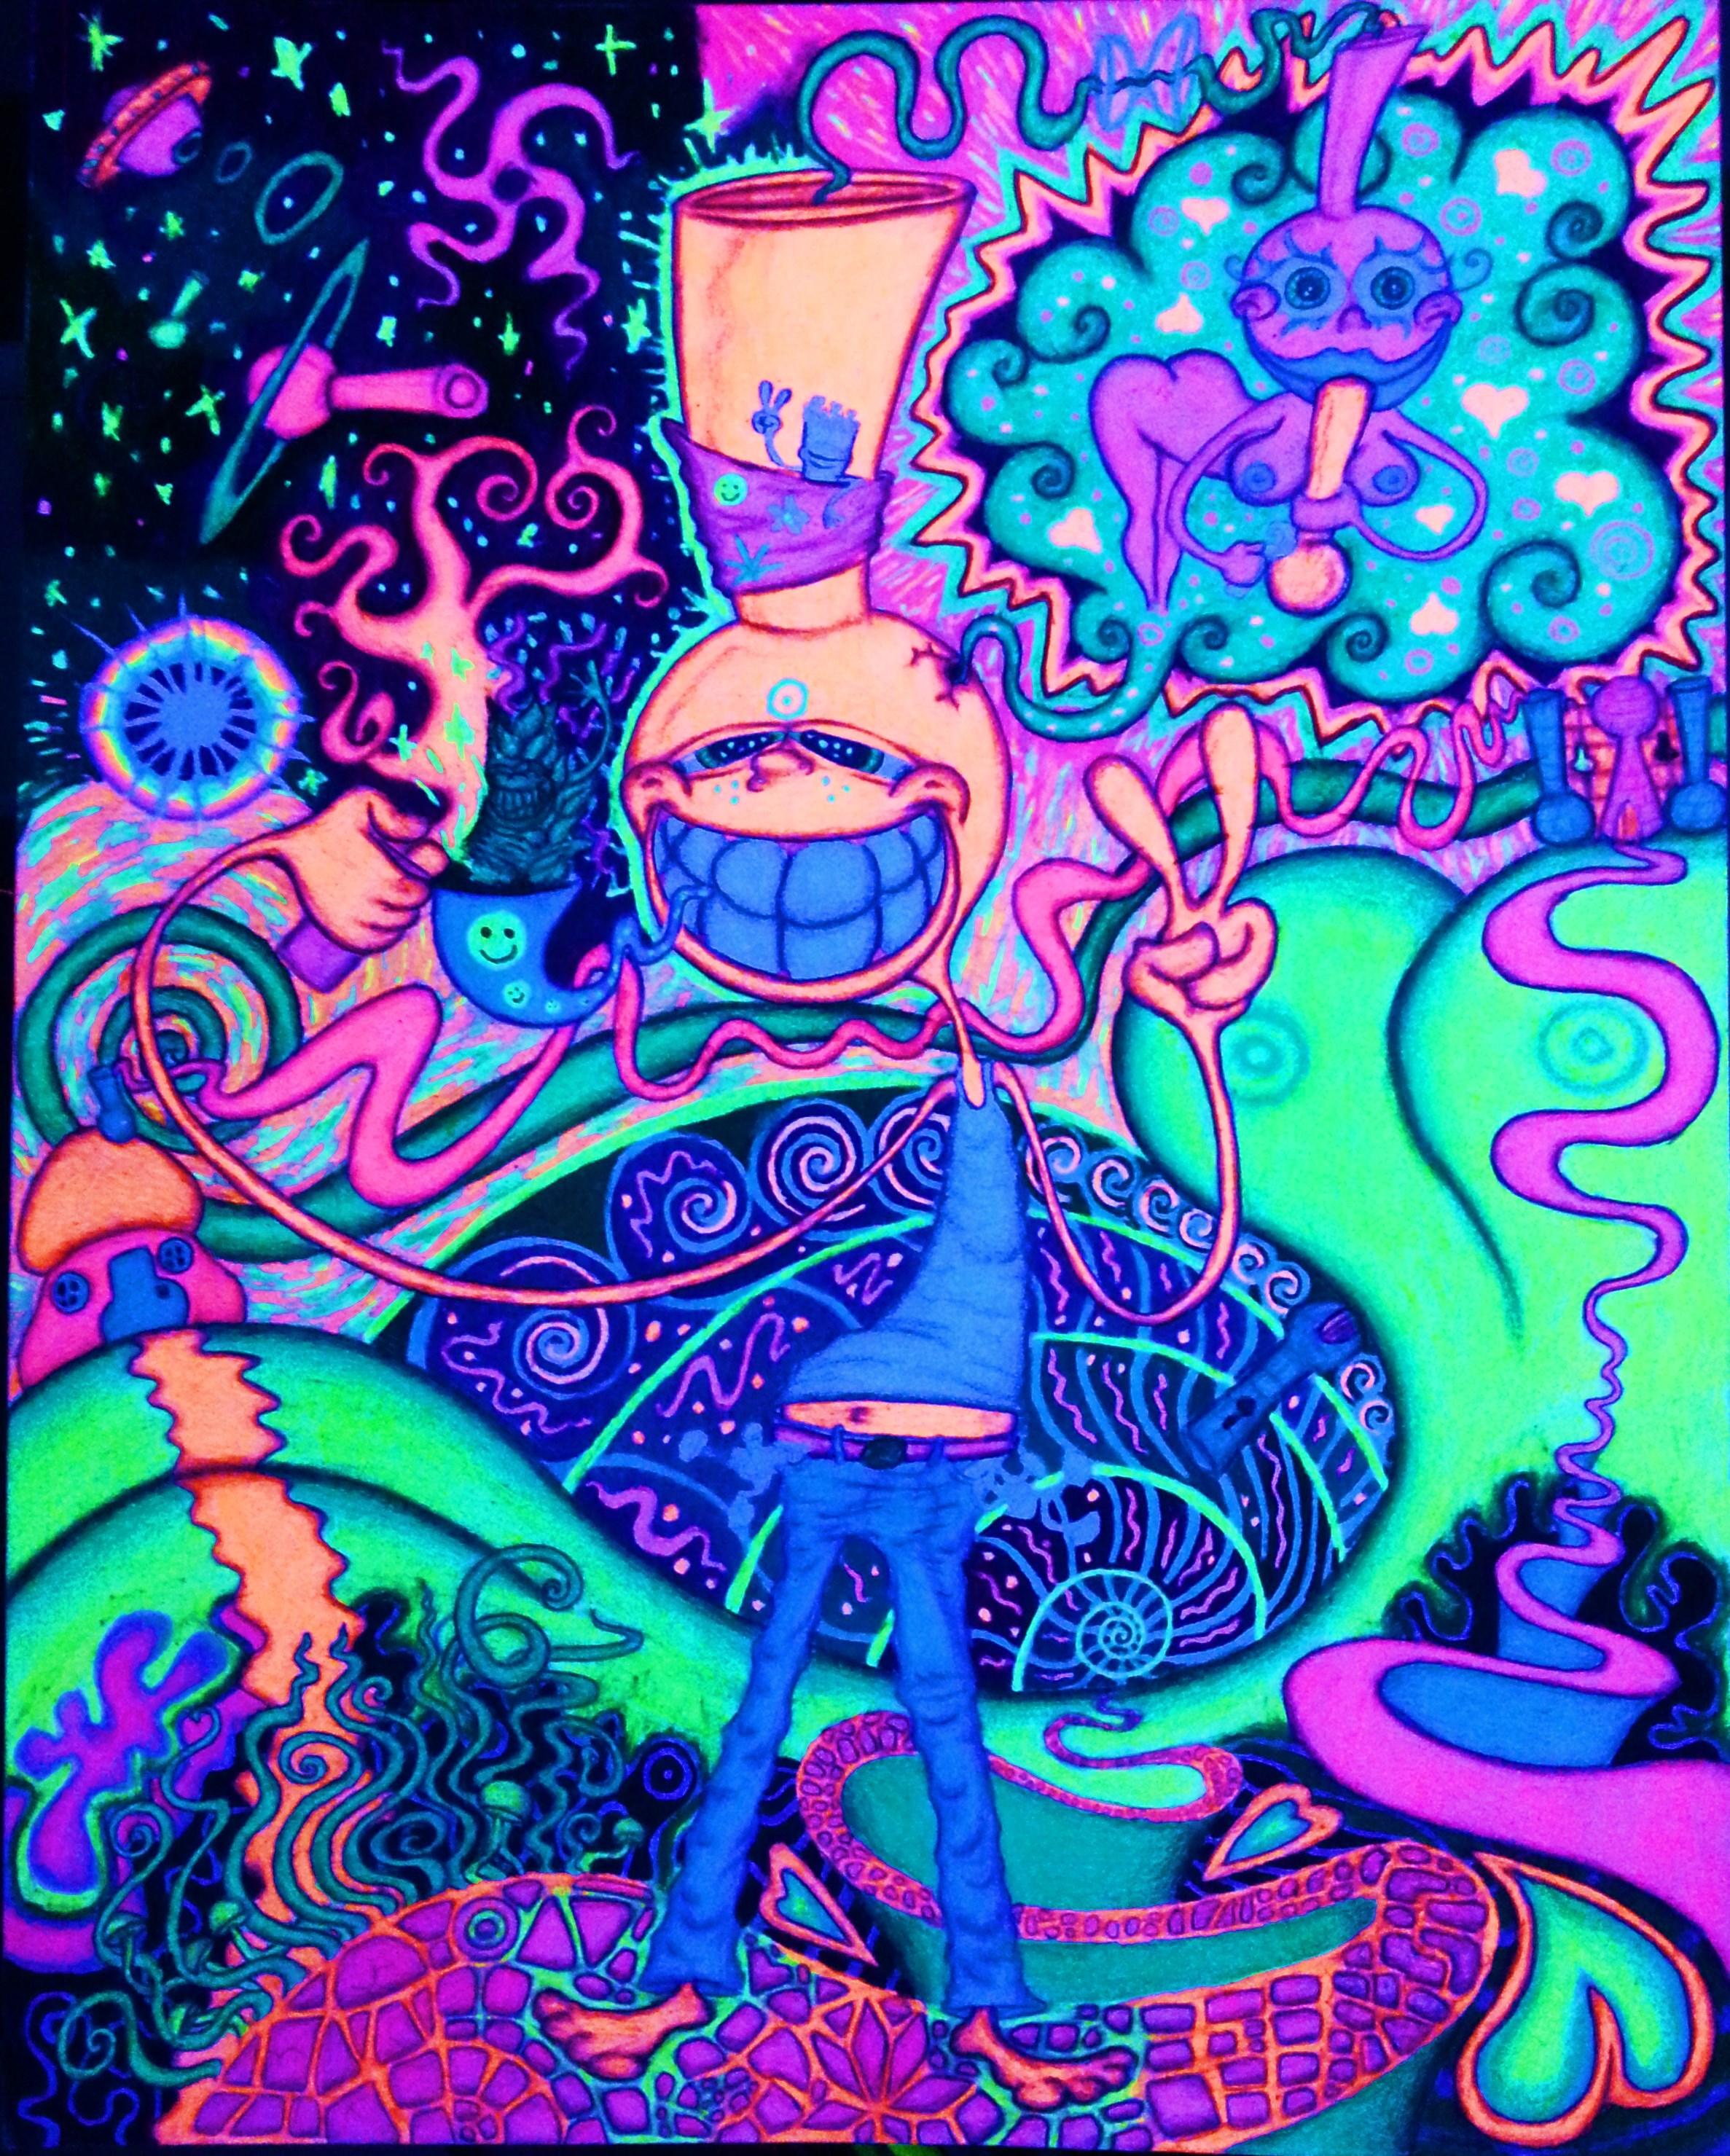 adriel restrepo featured marijuana artist stoner artwork Reggae Wallpaper Dancehall Reggae